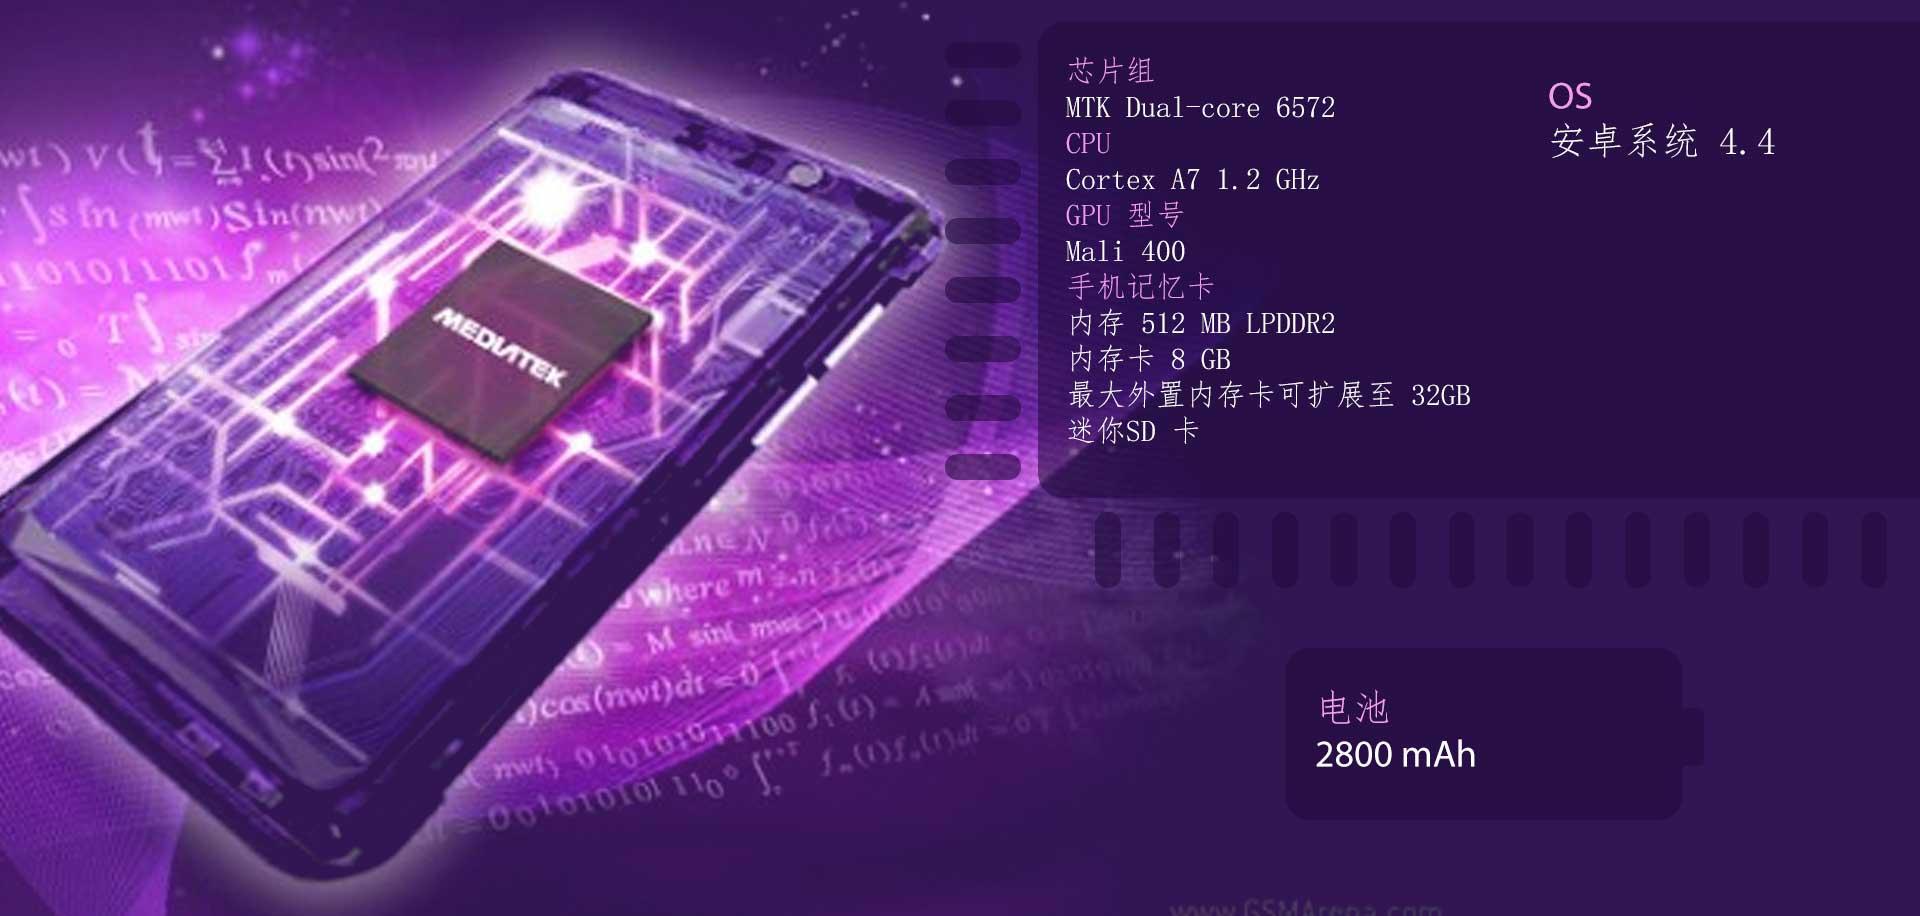 chipset-etc-706-a